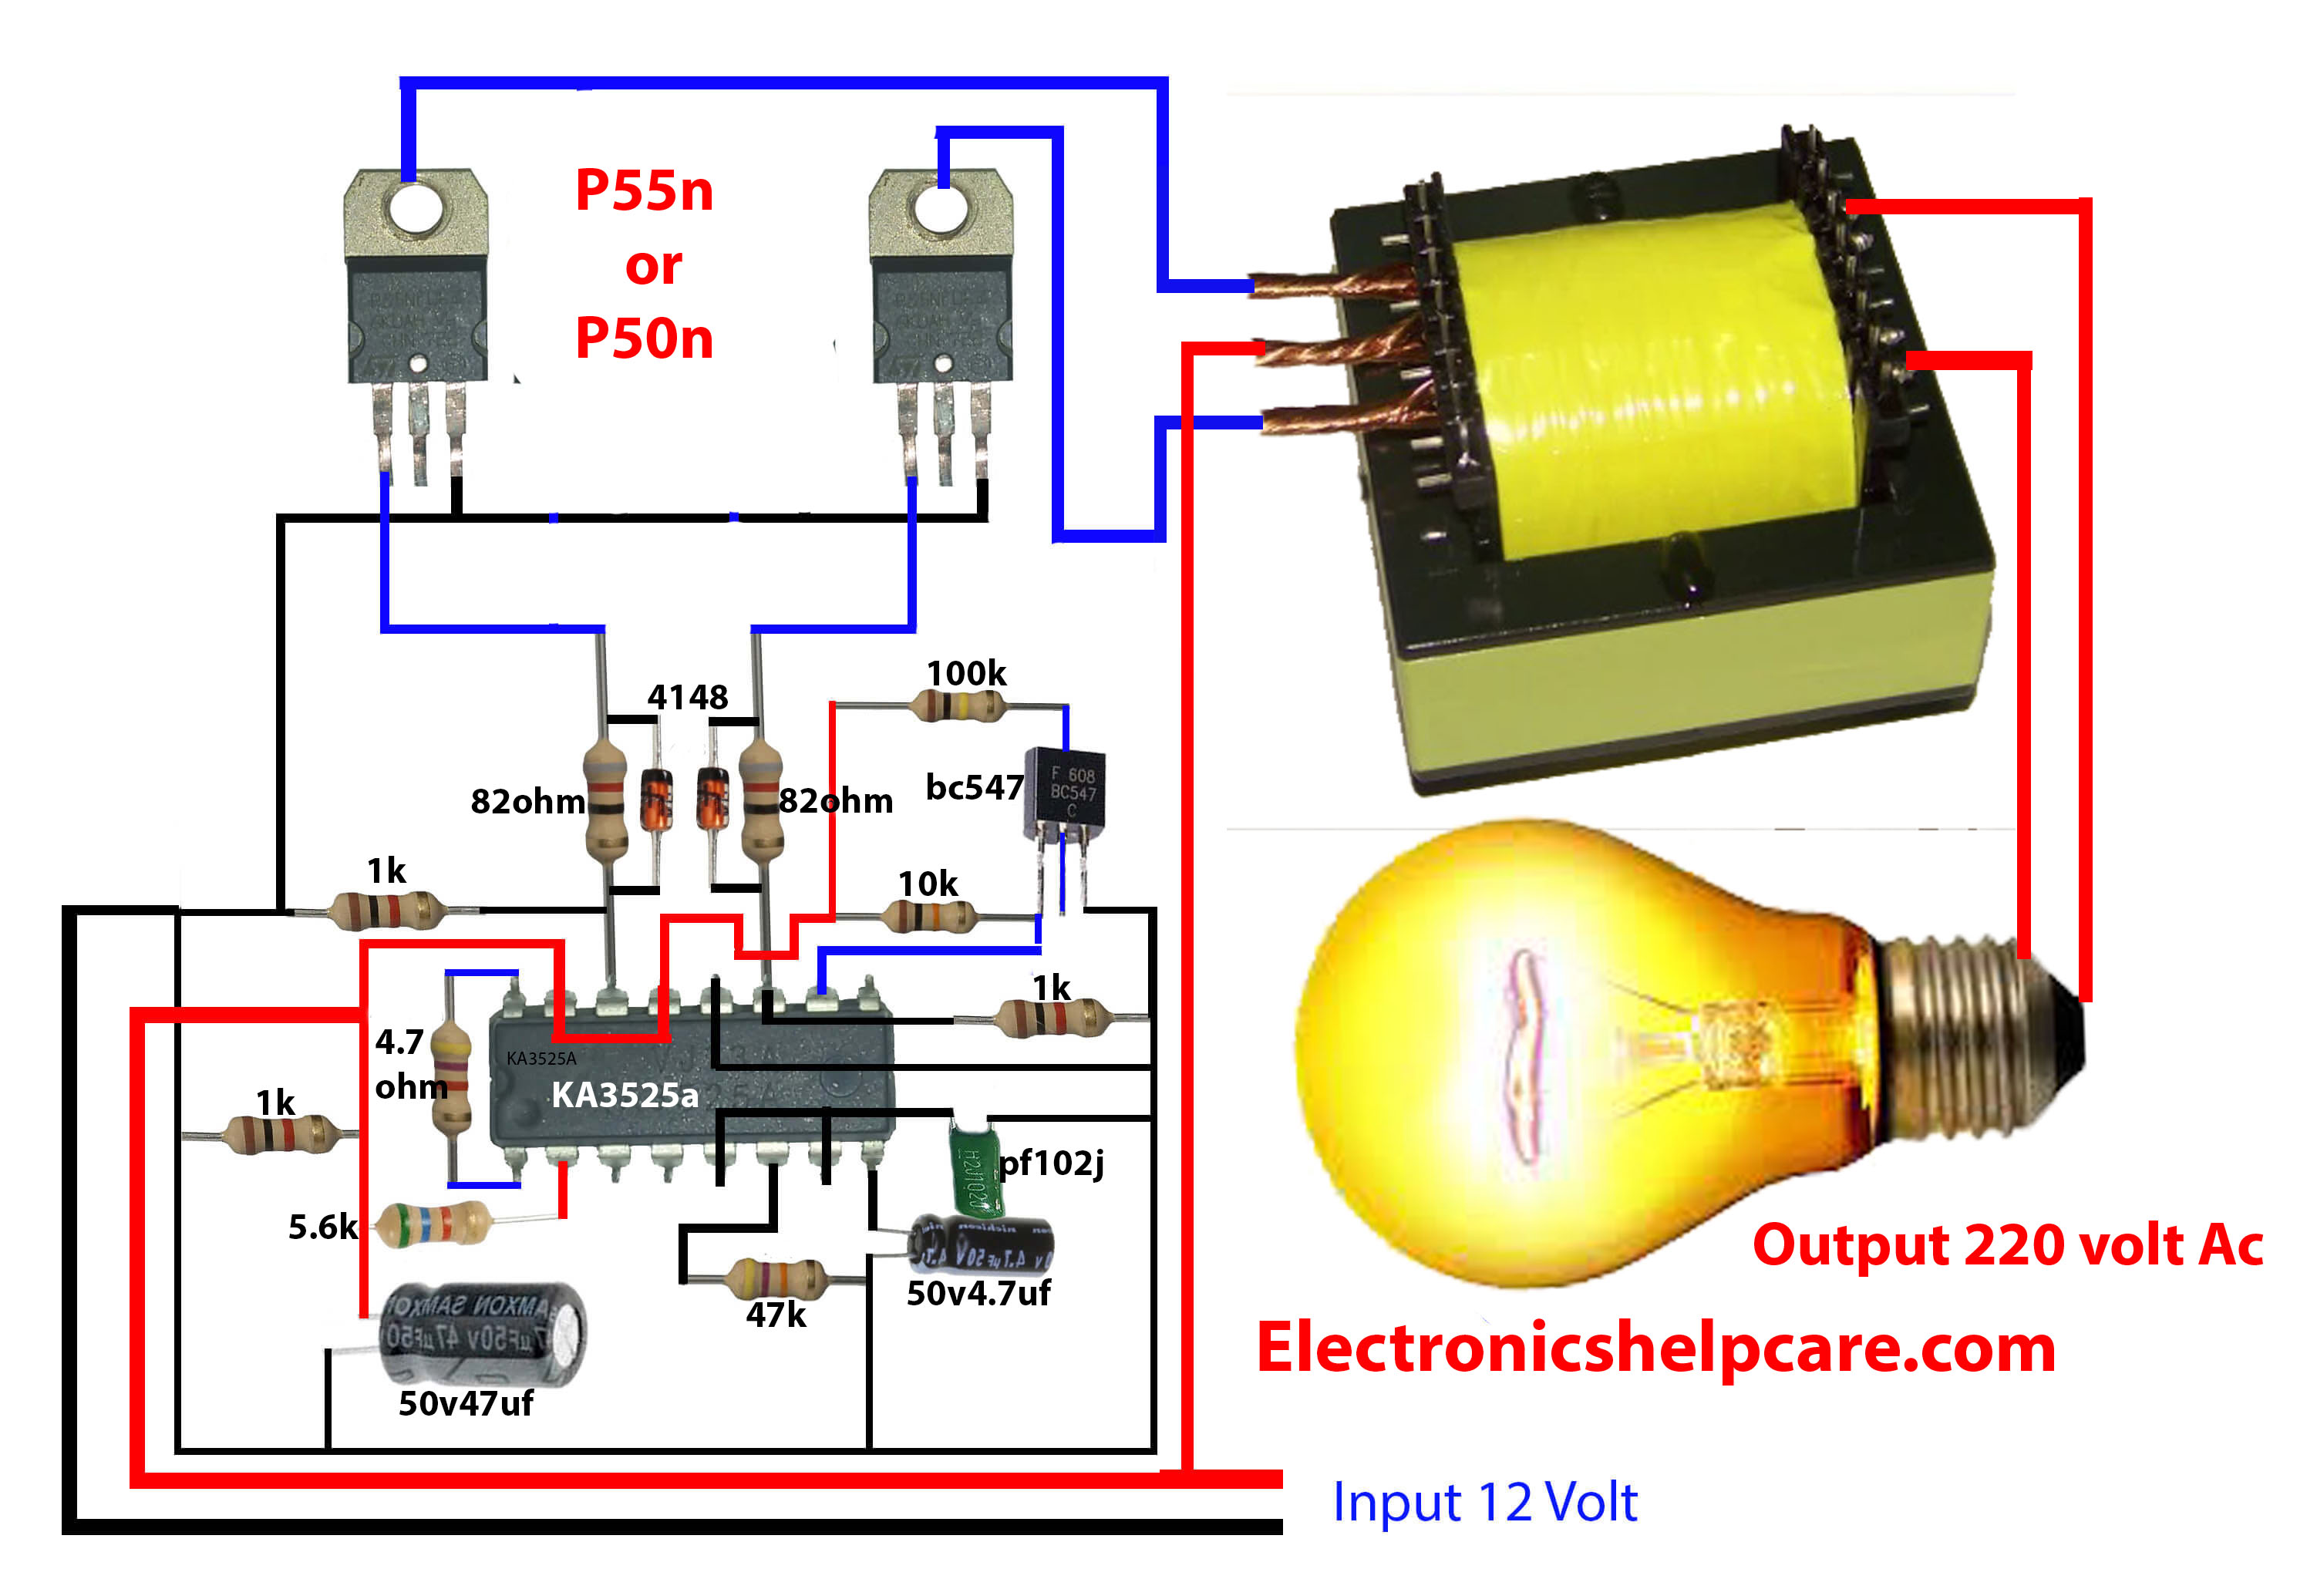 [DIAGRAM_5LK]  How to make inverter 12v dc to 220v ac? making circuit diagram? making  transformer? electronics - Electronics Help Care | Ac 220v Schematic Wiring |  | Electronics Help Care